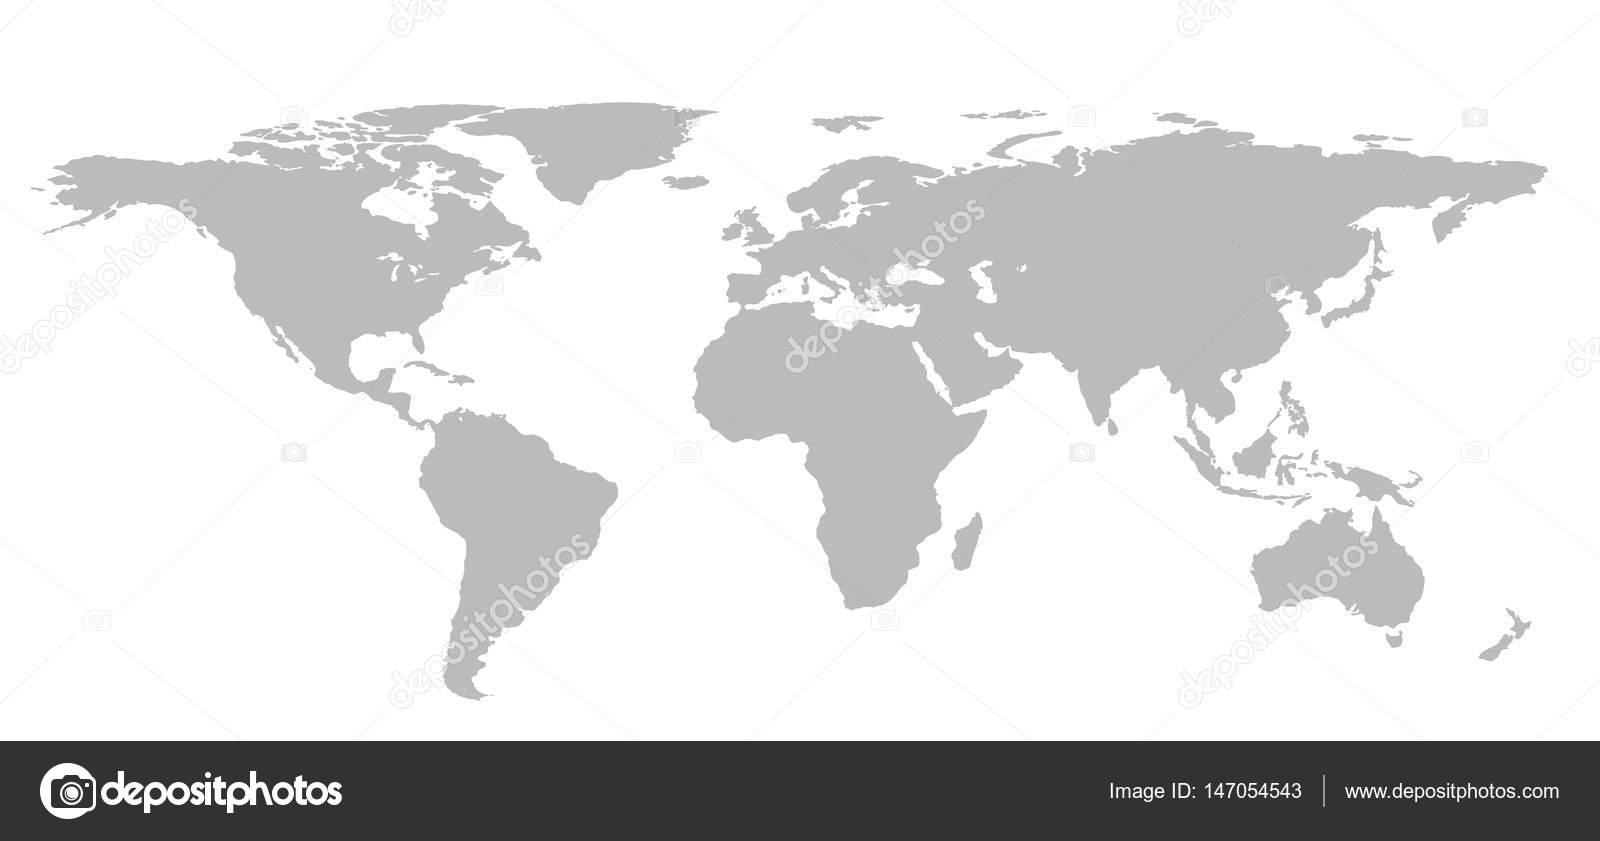 blank grey world map isolated on white background infographics illustration photo by tampatrahotmailcom